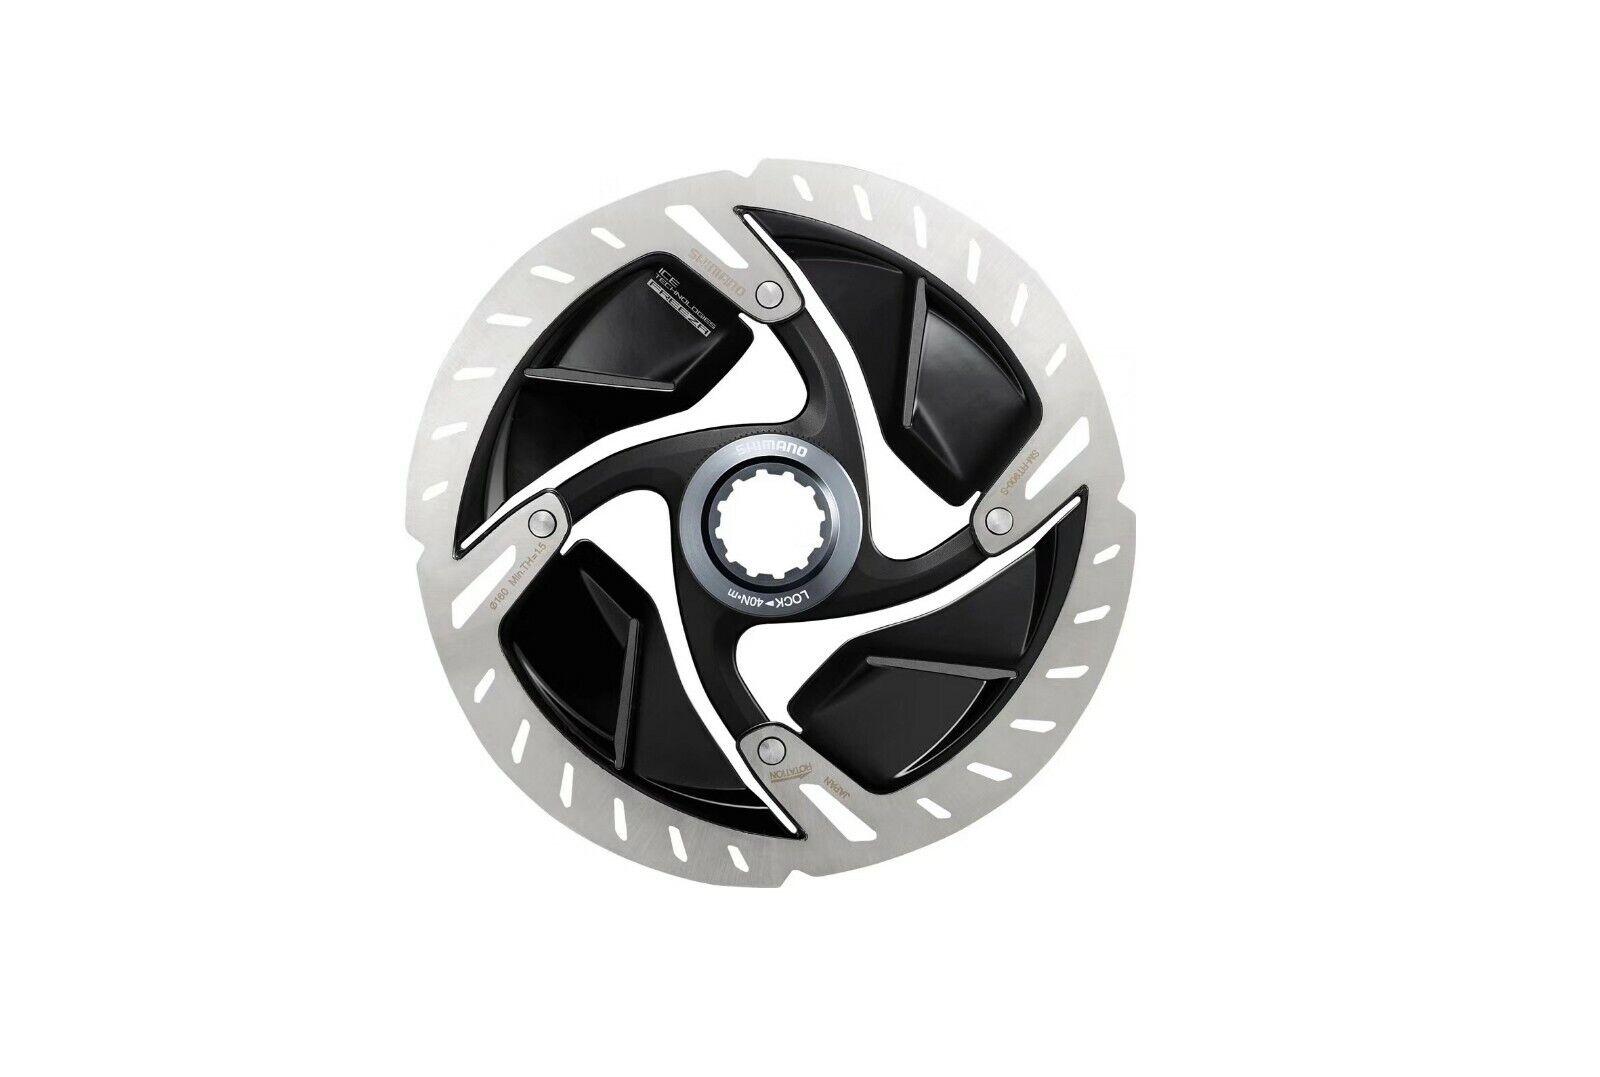 SHIMANO Dura Ace SM-RT900 Ice-Tech Freeza Centerlock Disc Rotor 140mm//160mm 1 PC